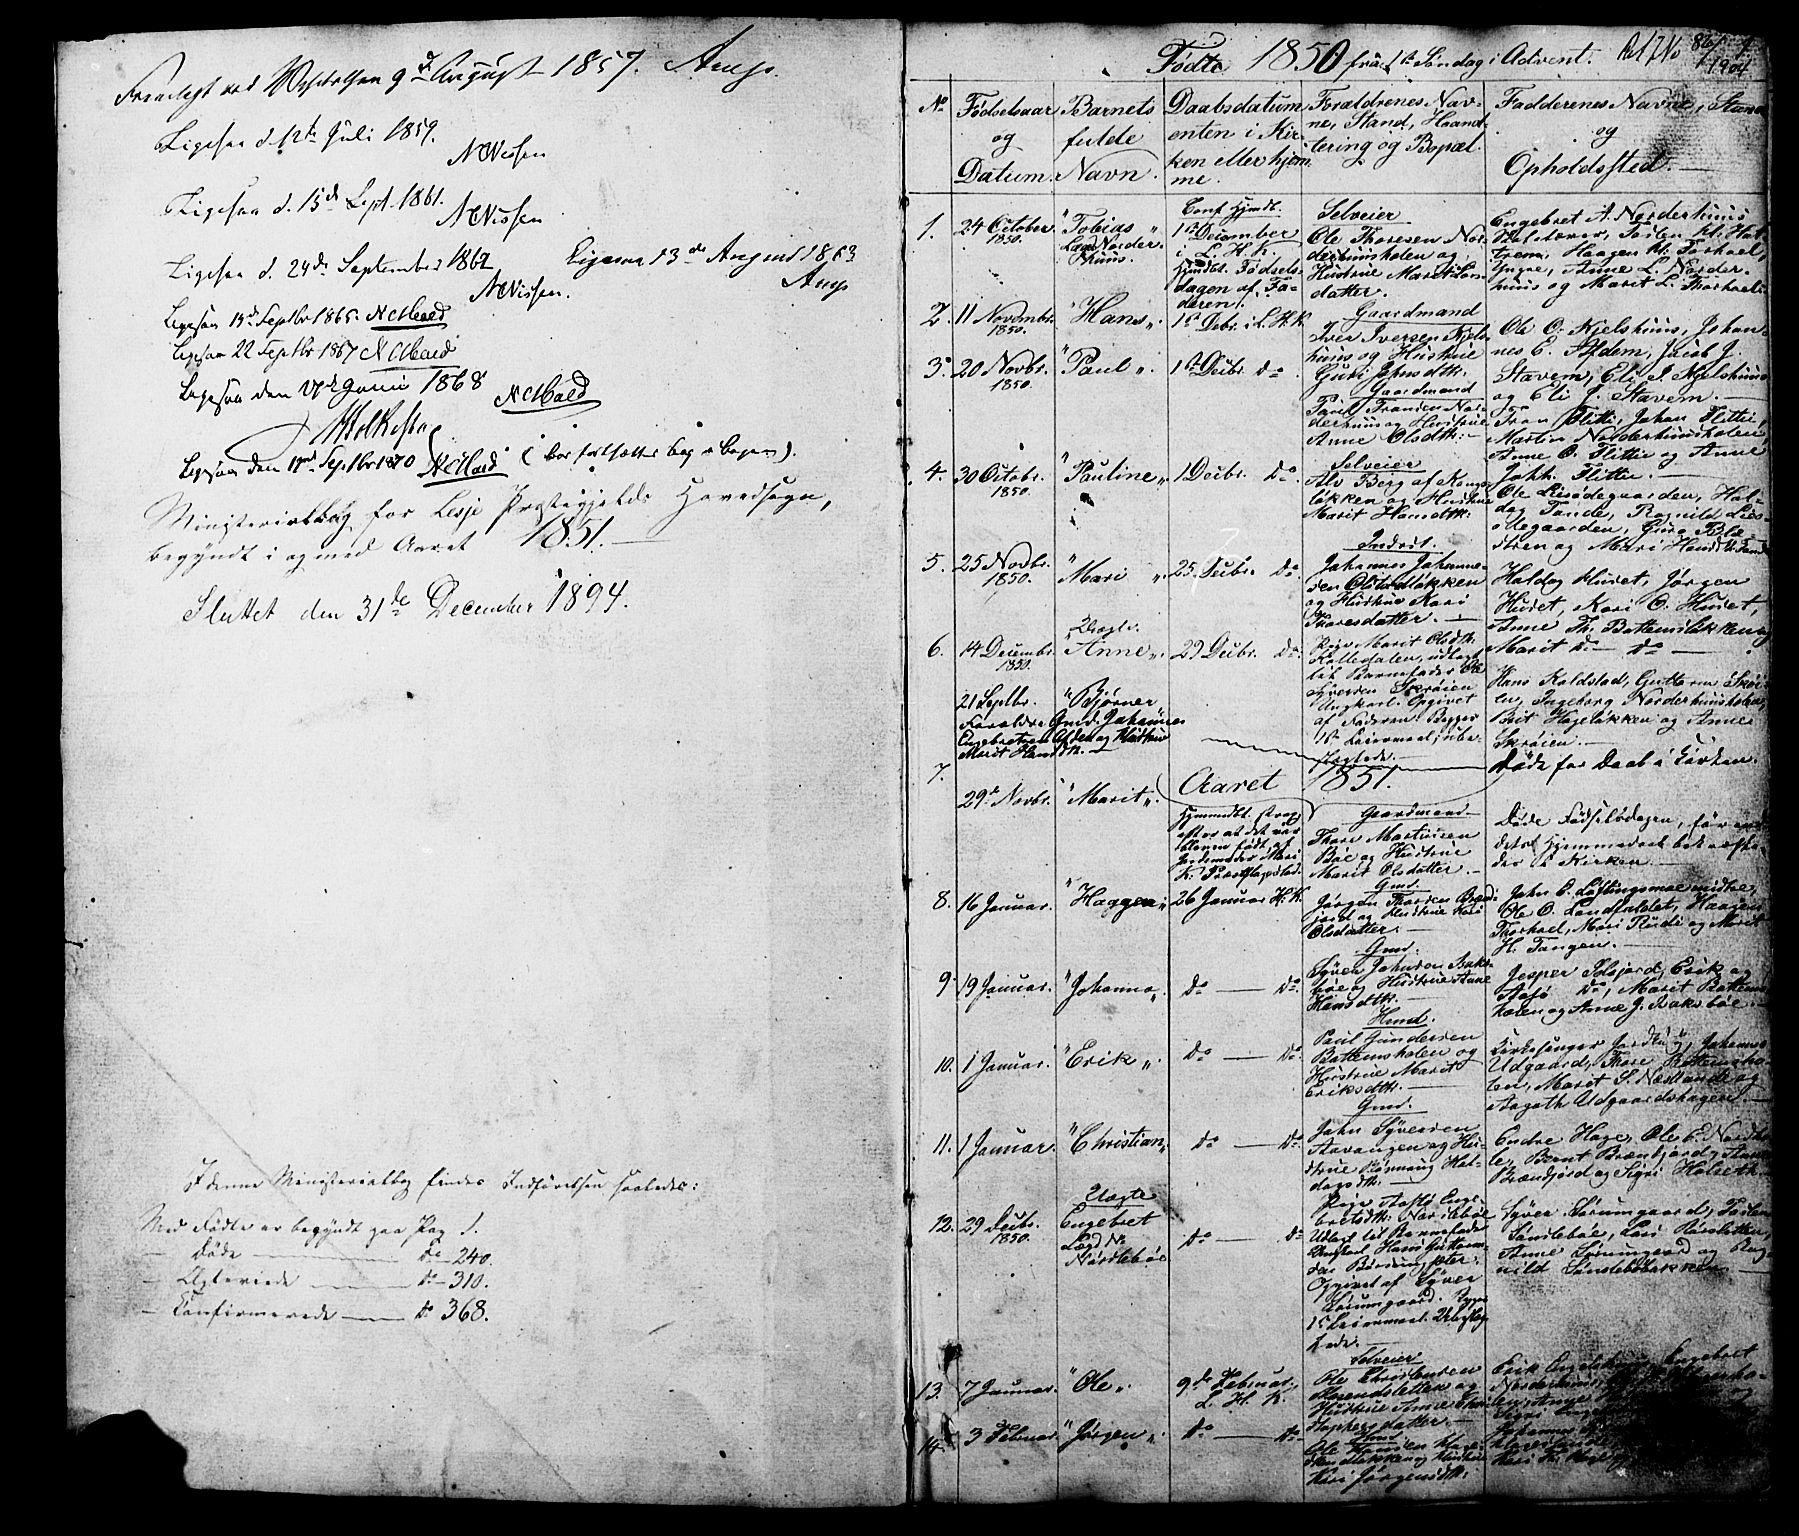 SAH, Lesja prestekontor, Klokkerbok nr. 5, 1850-1894, s. 1-2